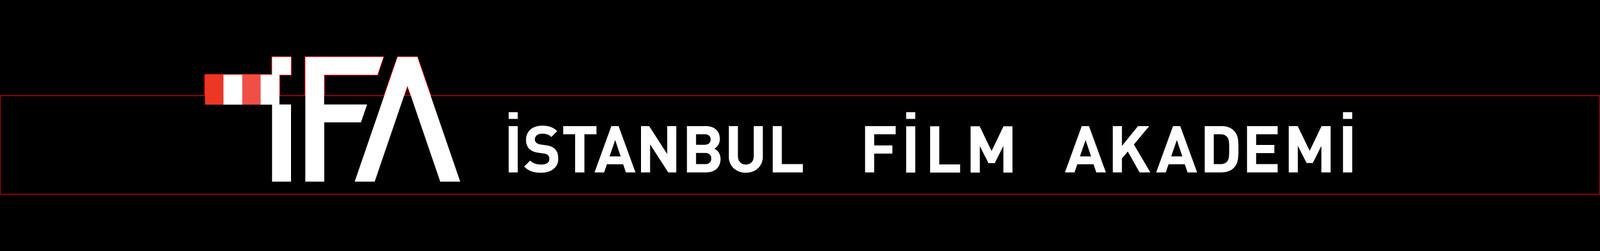 IFA Istanbul Film Akademi